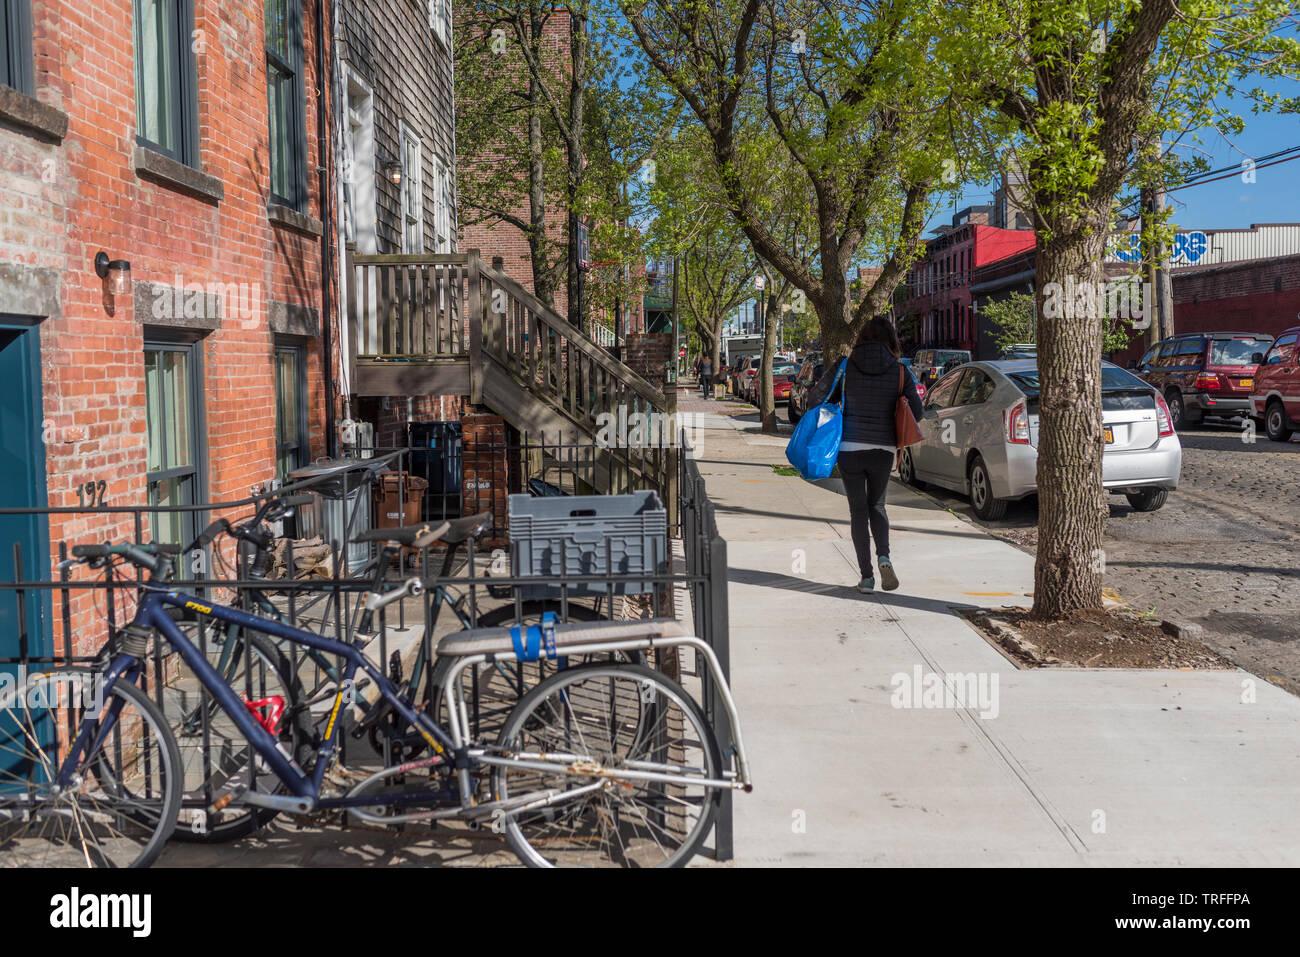 a woman walks down a sreet in brooklyn, ny - Stock Image